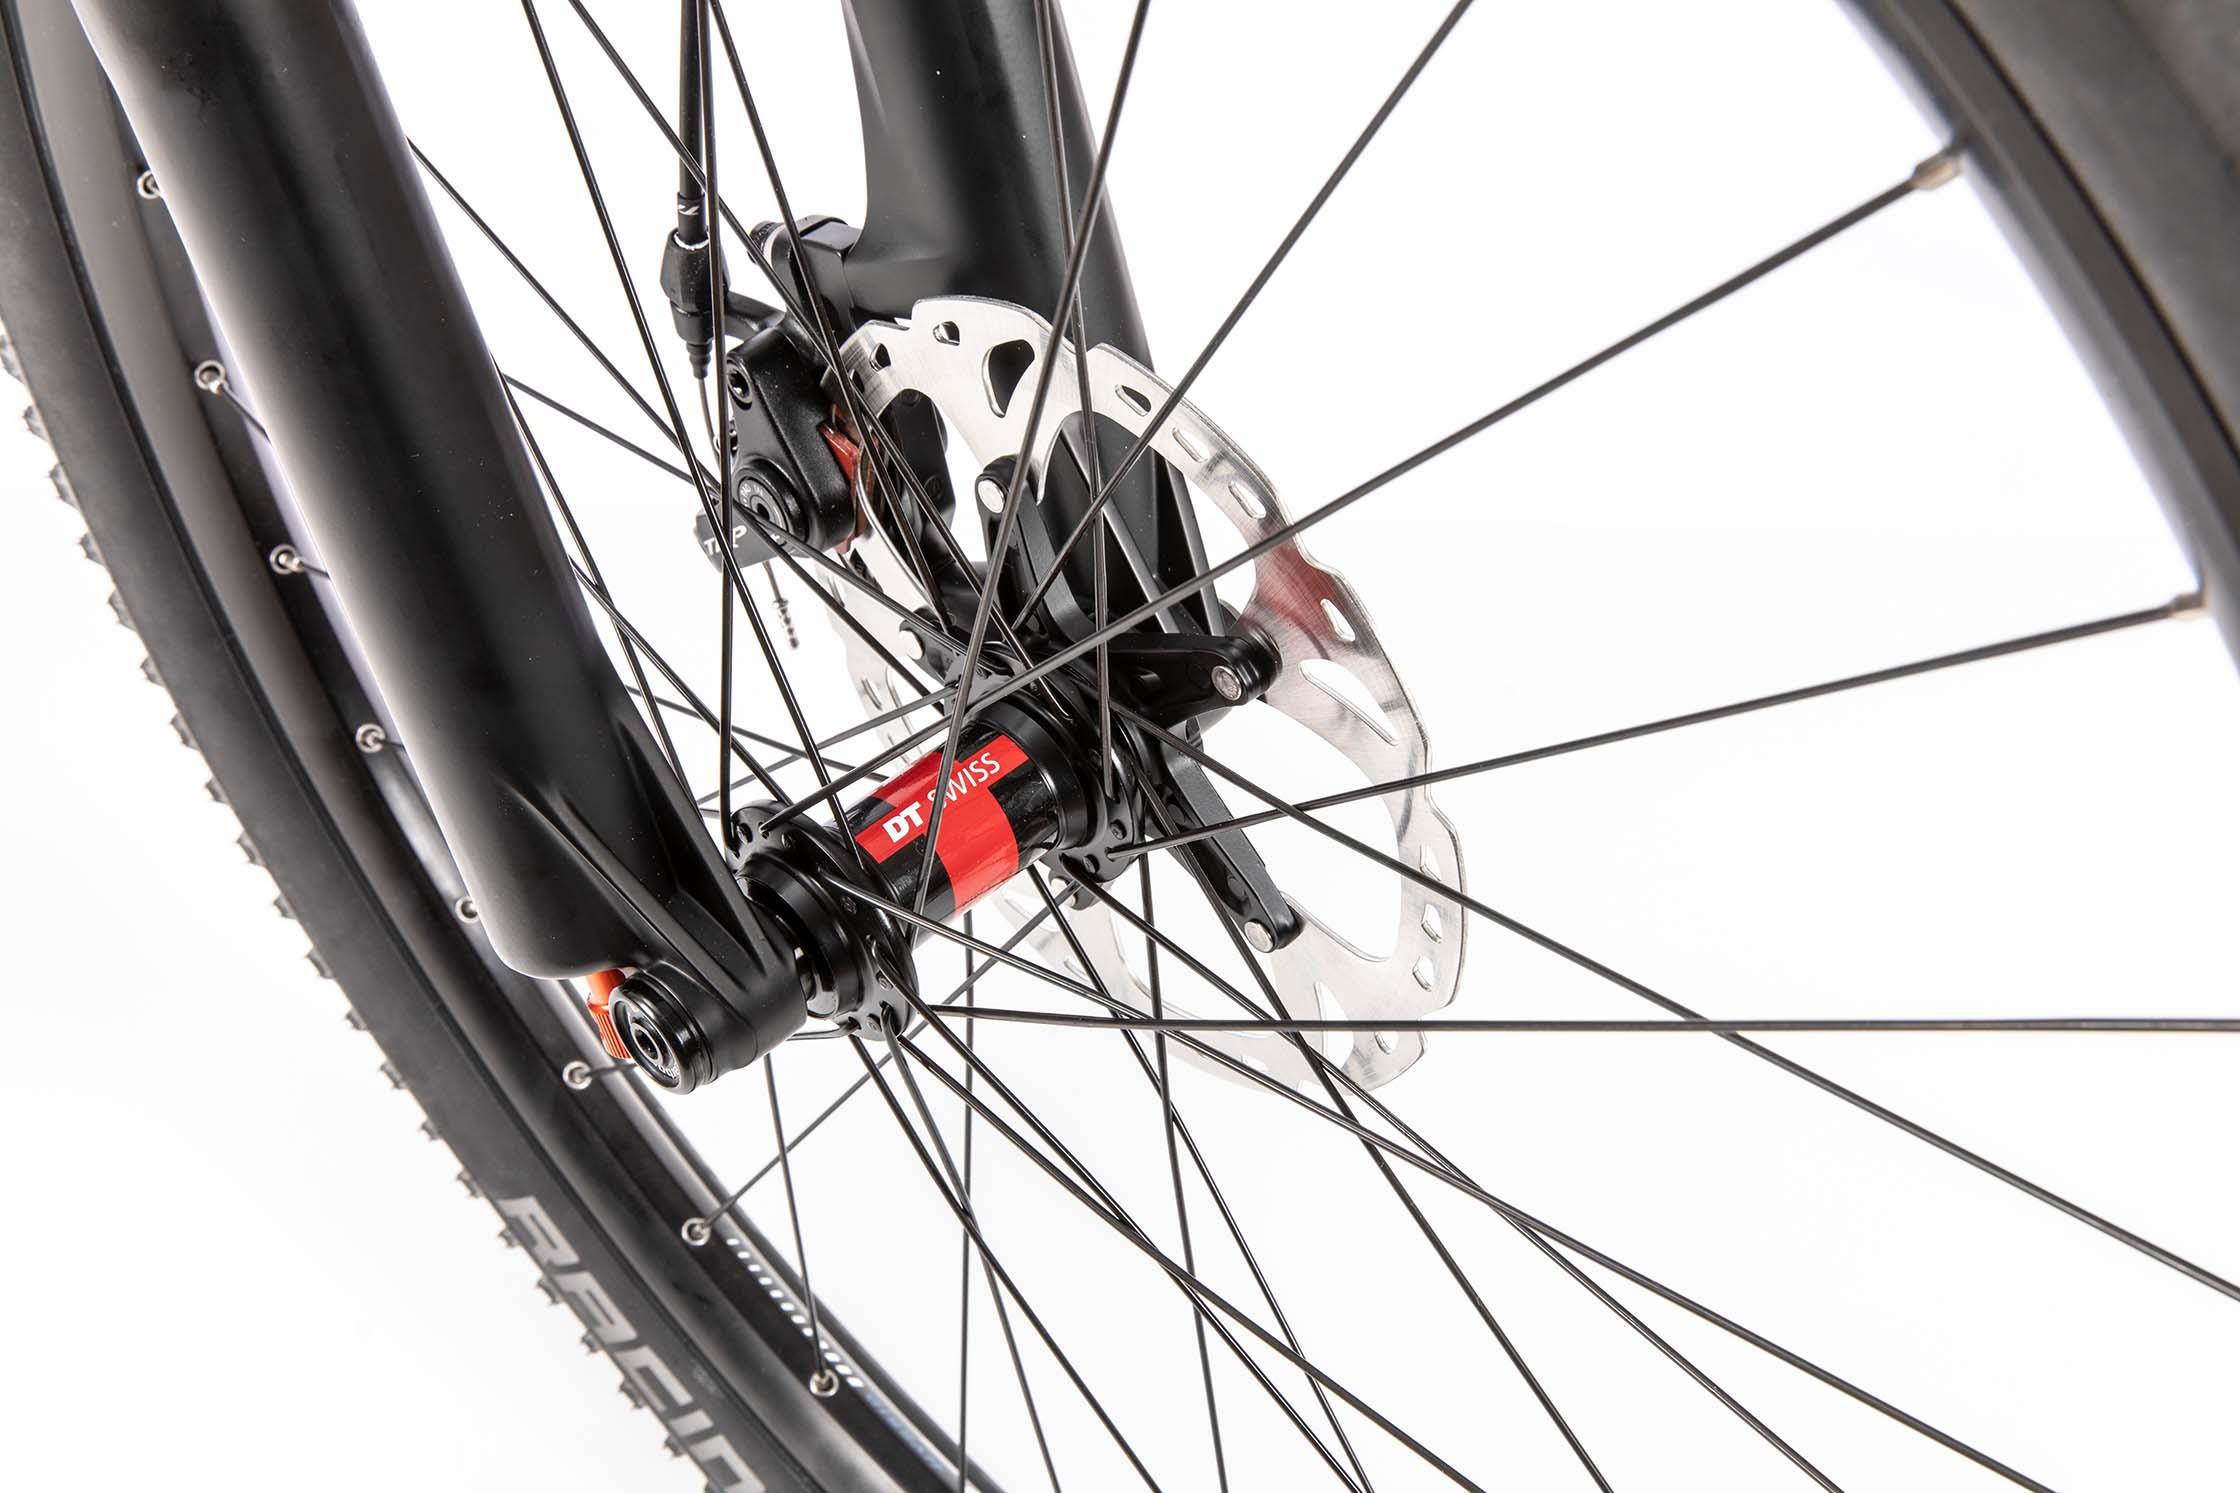 Mass Titan Mountainbike Hardtail für Bike Adventure Touren_3